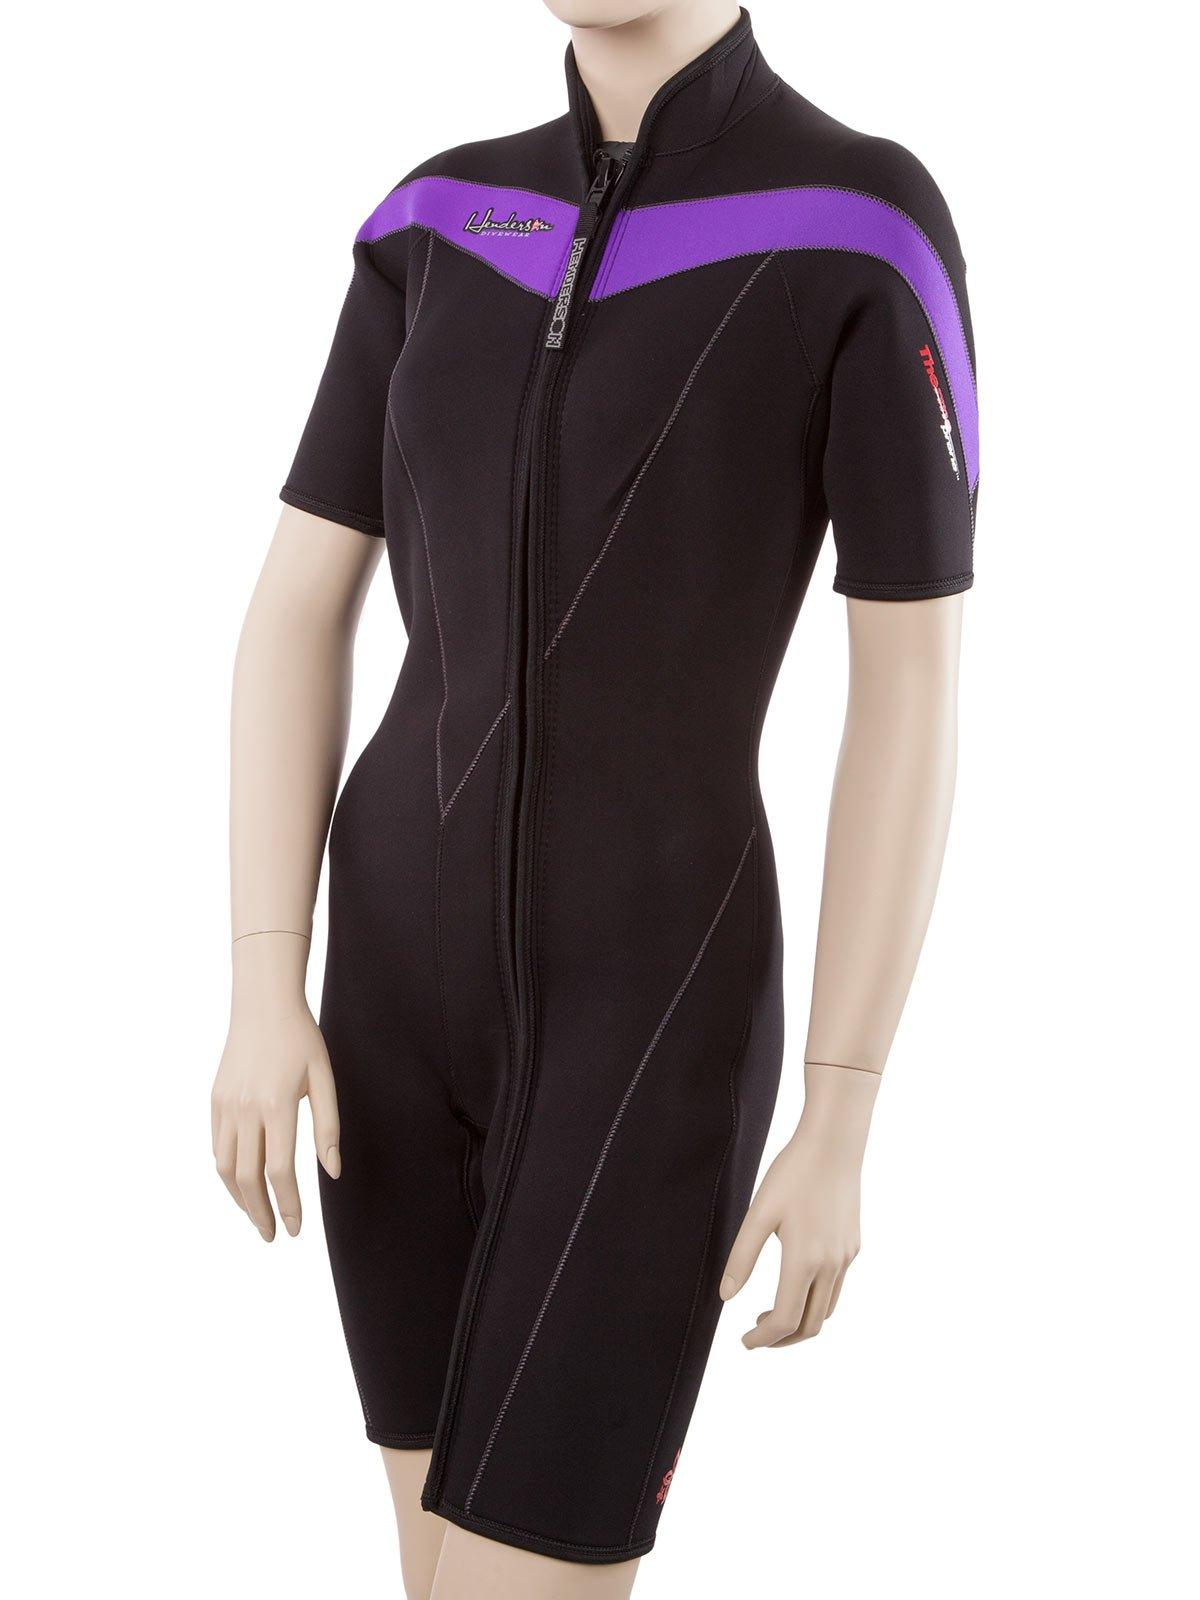 Henderson Thermoprene 3mm womens front zip wetsuit (with Plus, Tall, & Petite) Women's 20 Black/dark purple